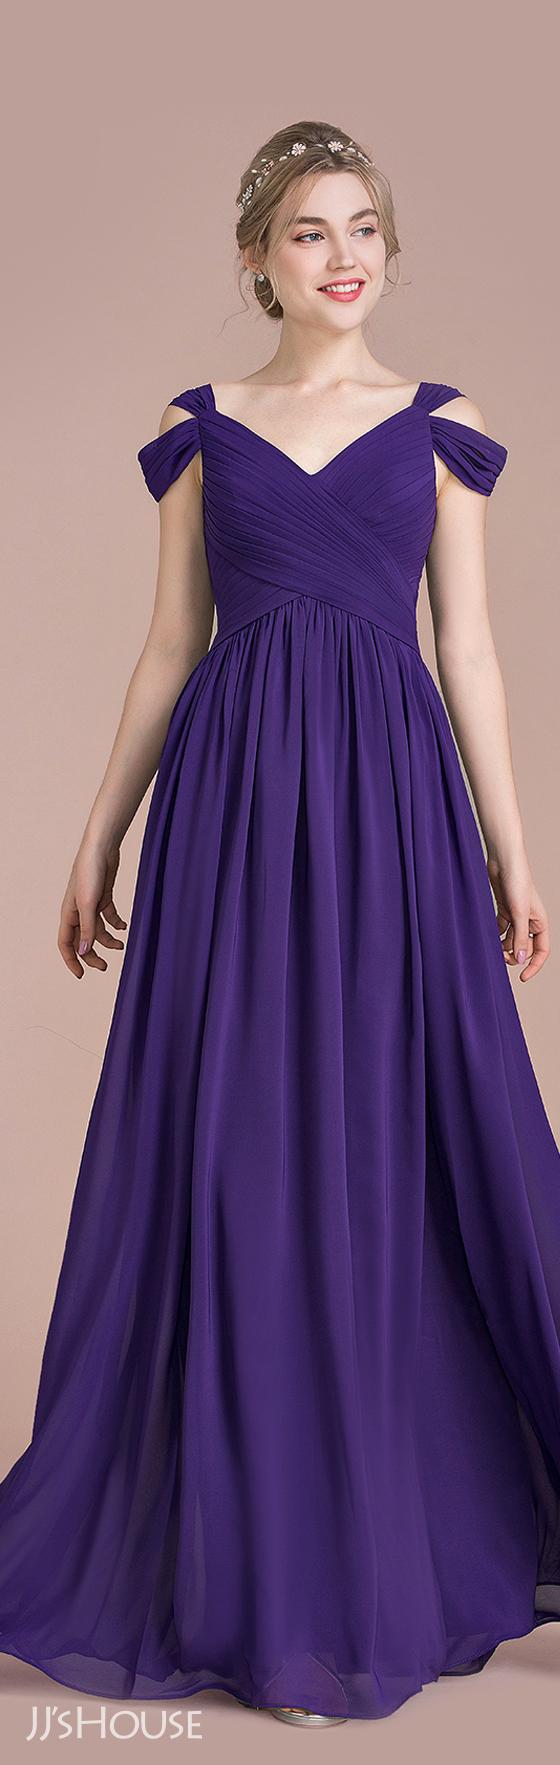 JJsHouse #Bridesmaid | diseños dbd | Pinterest | Vestiditos ...